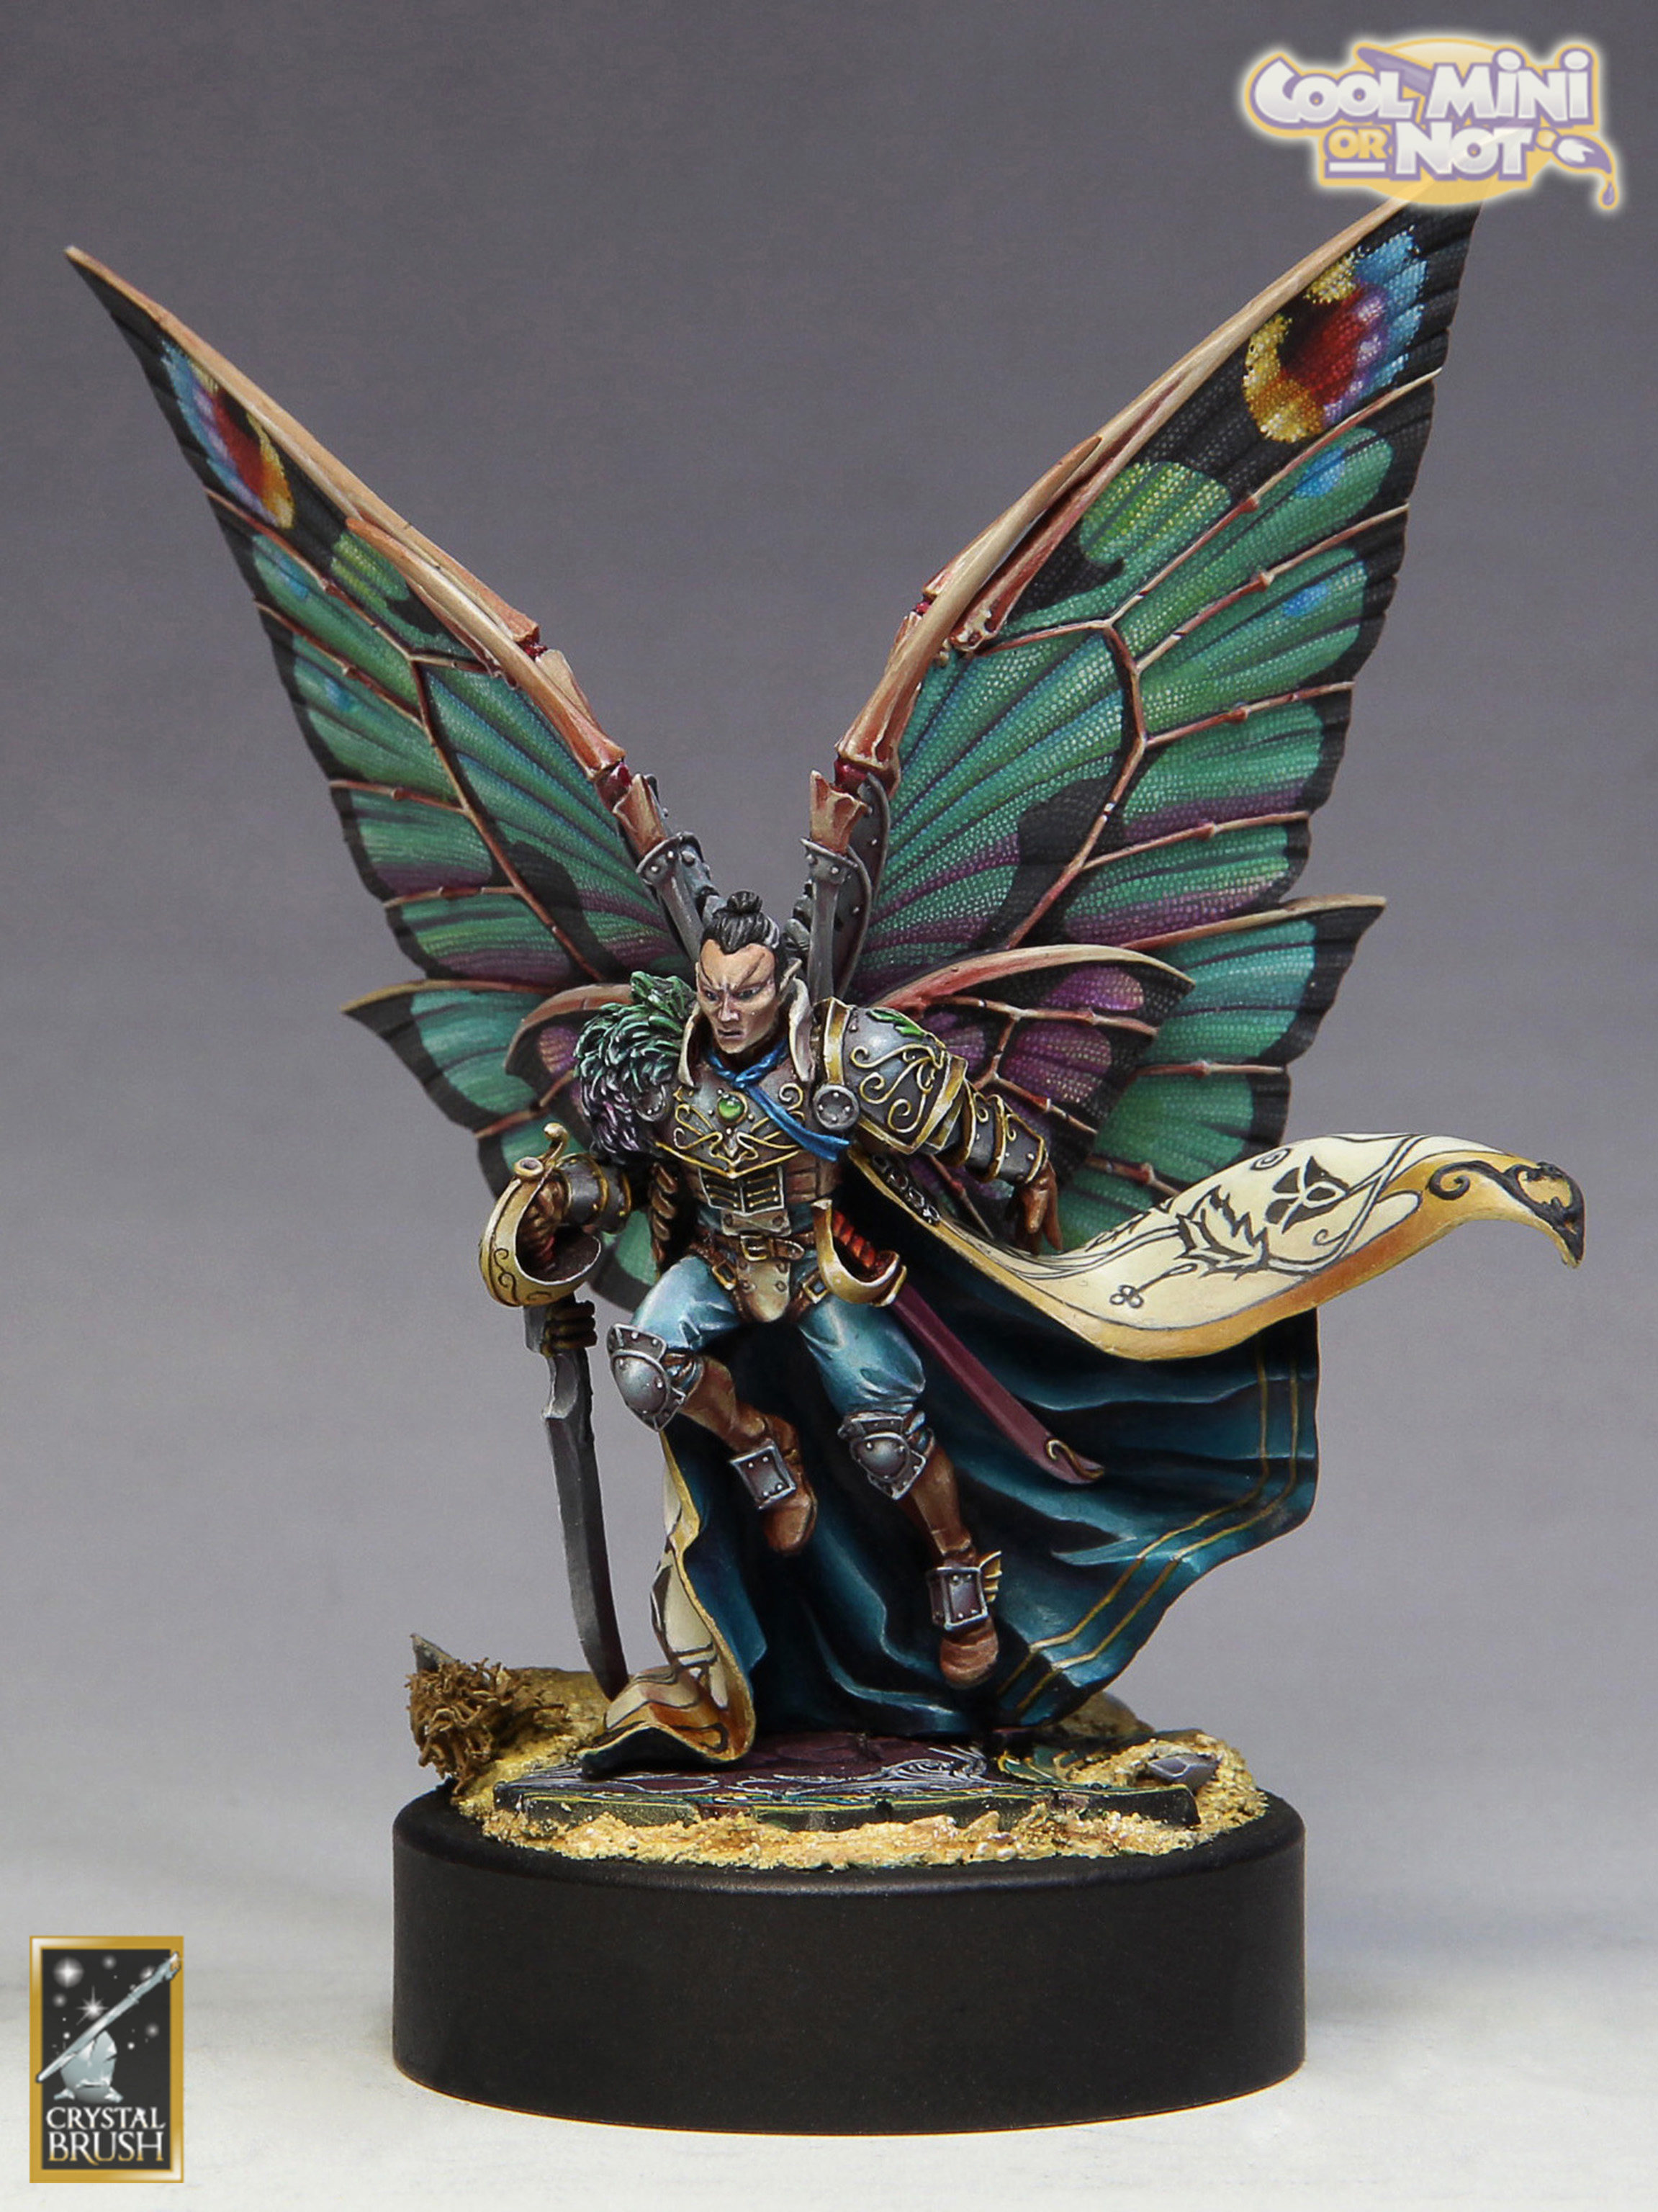 Fantasy & Steampunk Single Figure Crystal Brush